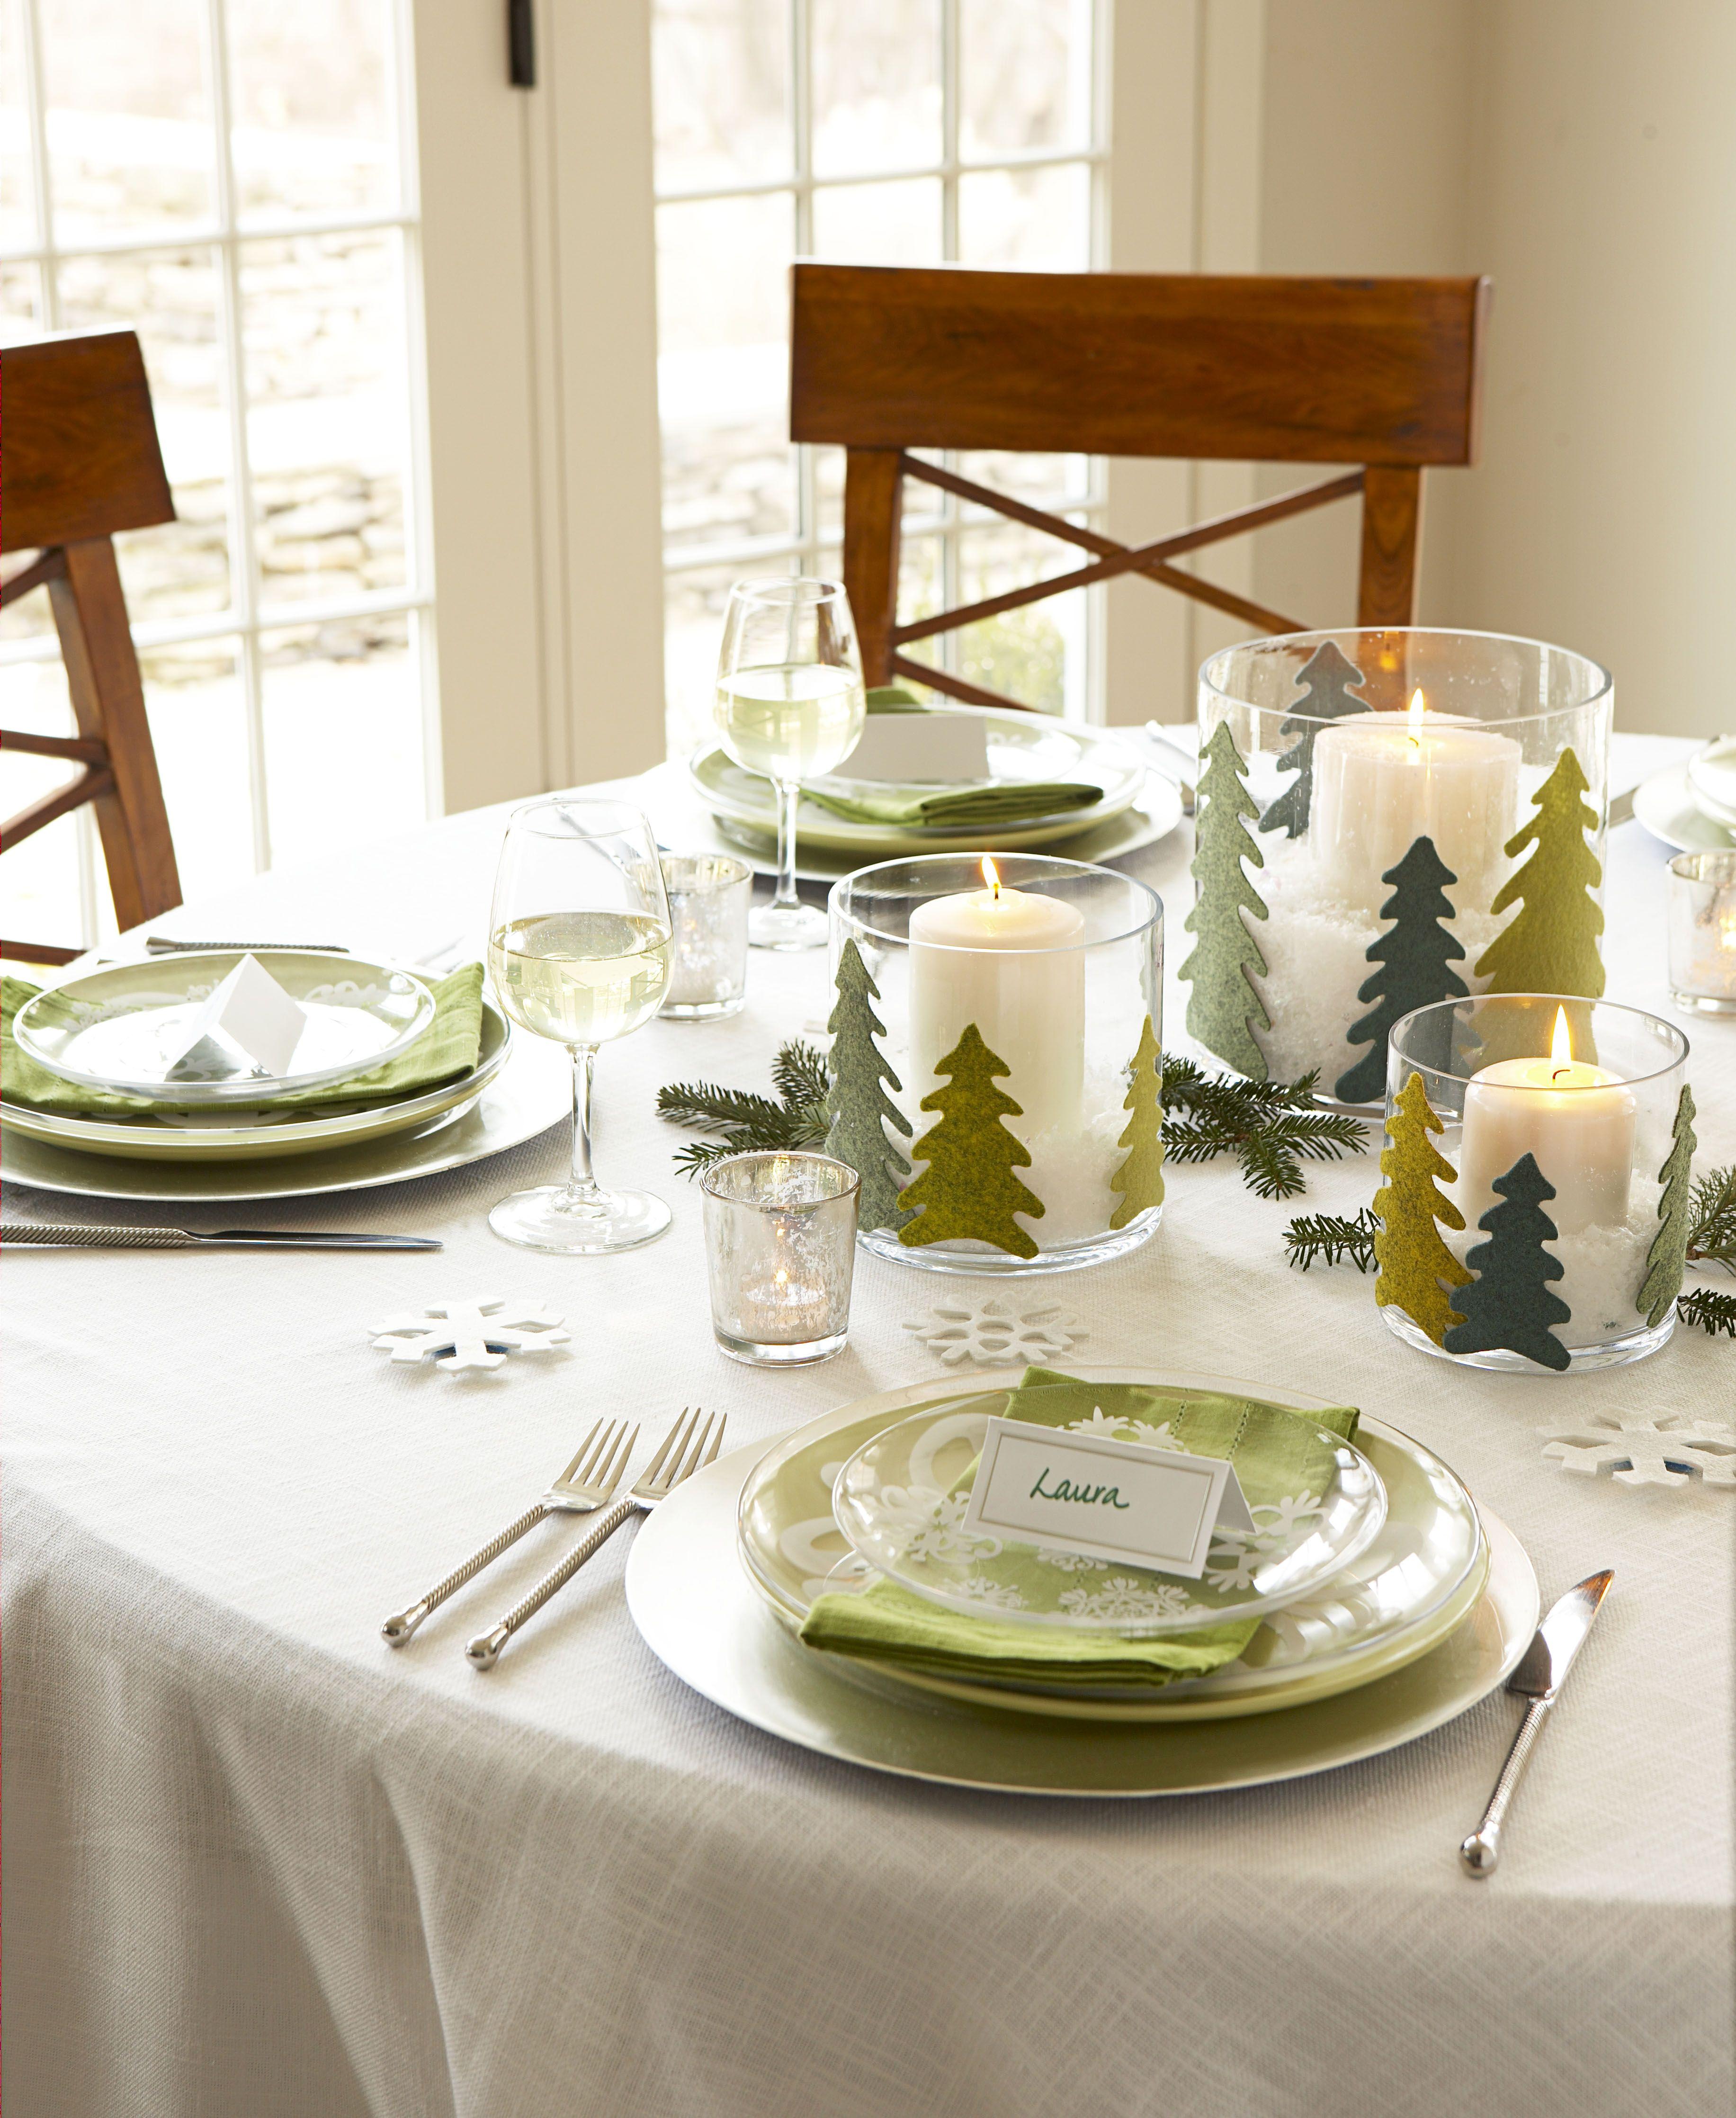 40 diy christmas table decorations and settings centerpiecesfelt pine tree christmas centerpiece